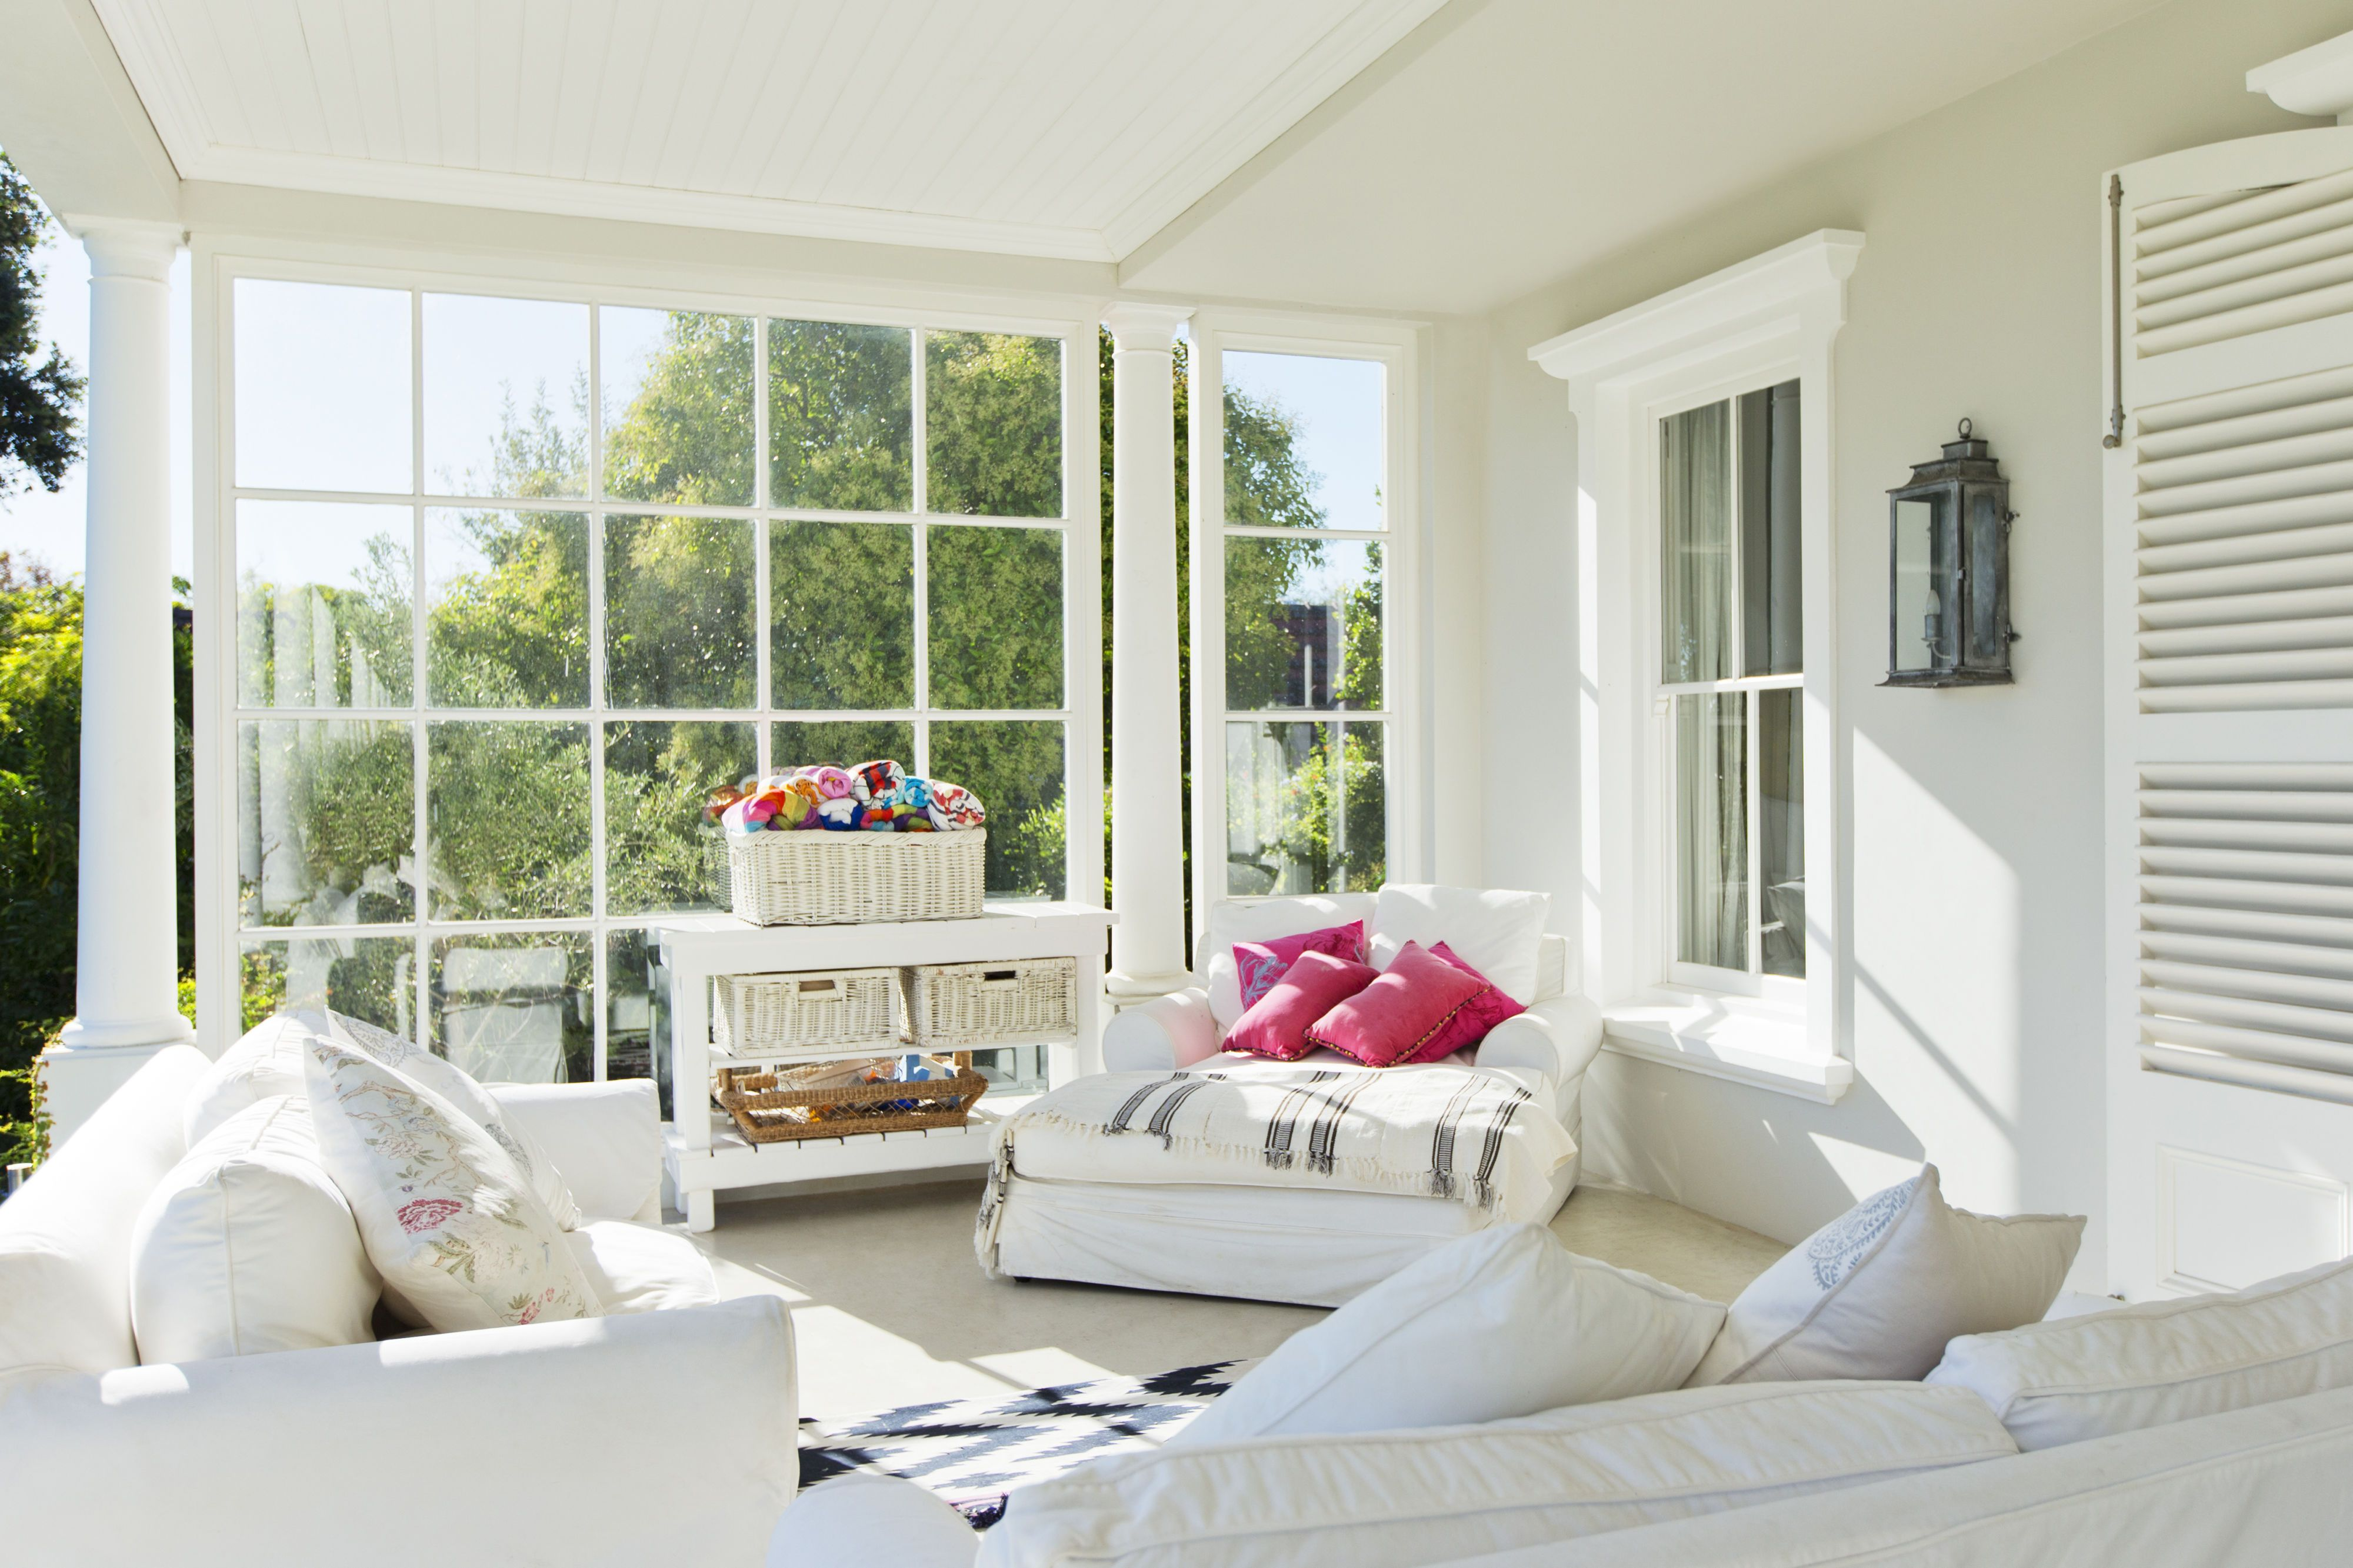 sunroom & 10 Sunroom Decorating Ideas - Best Designs for Sun Rooms